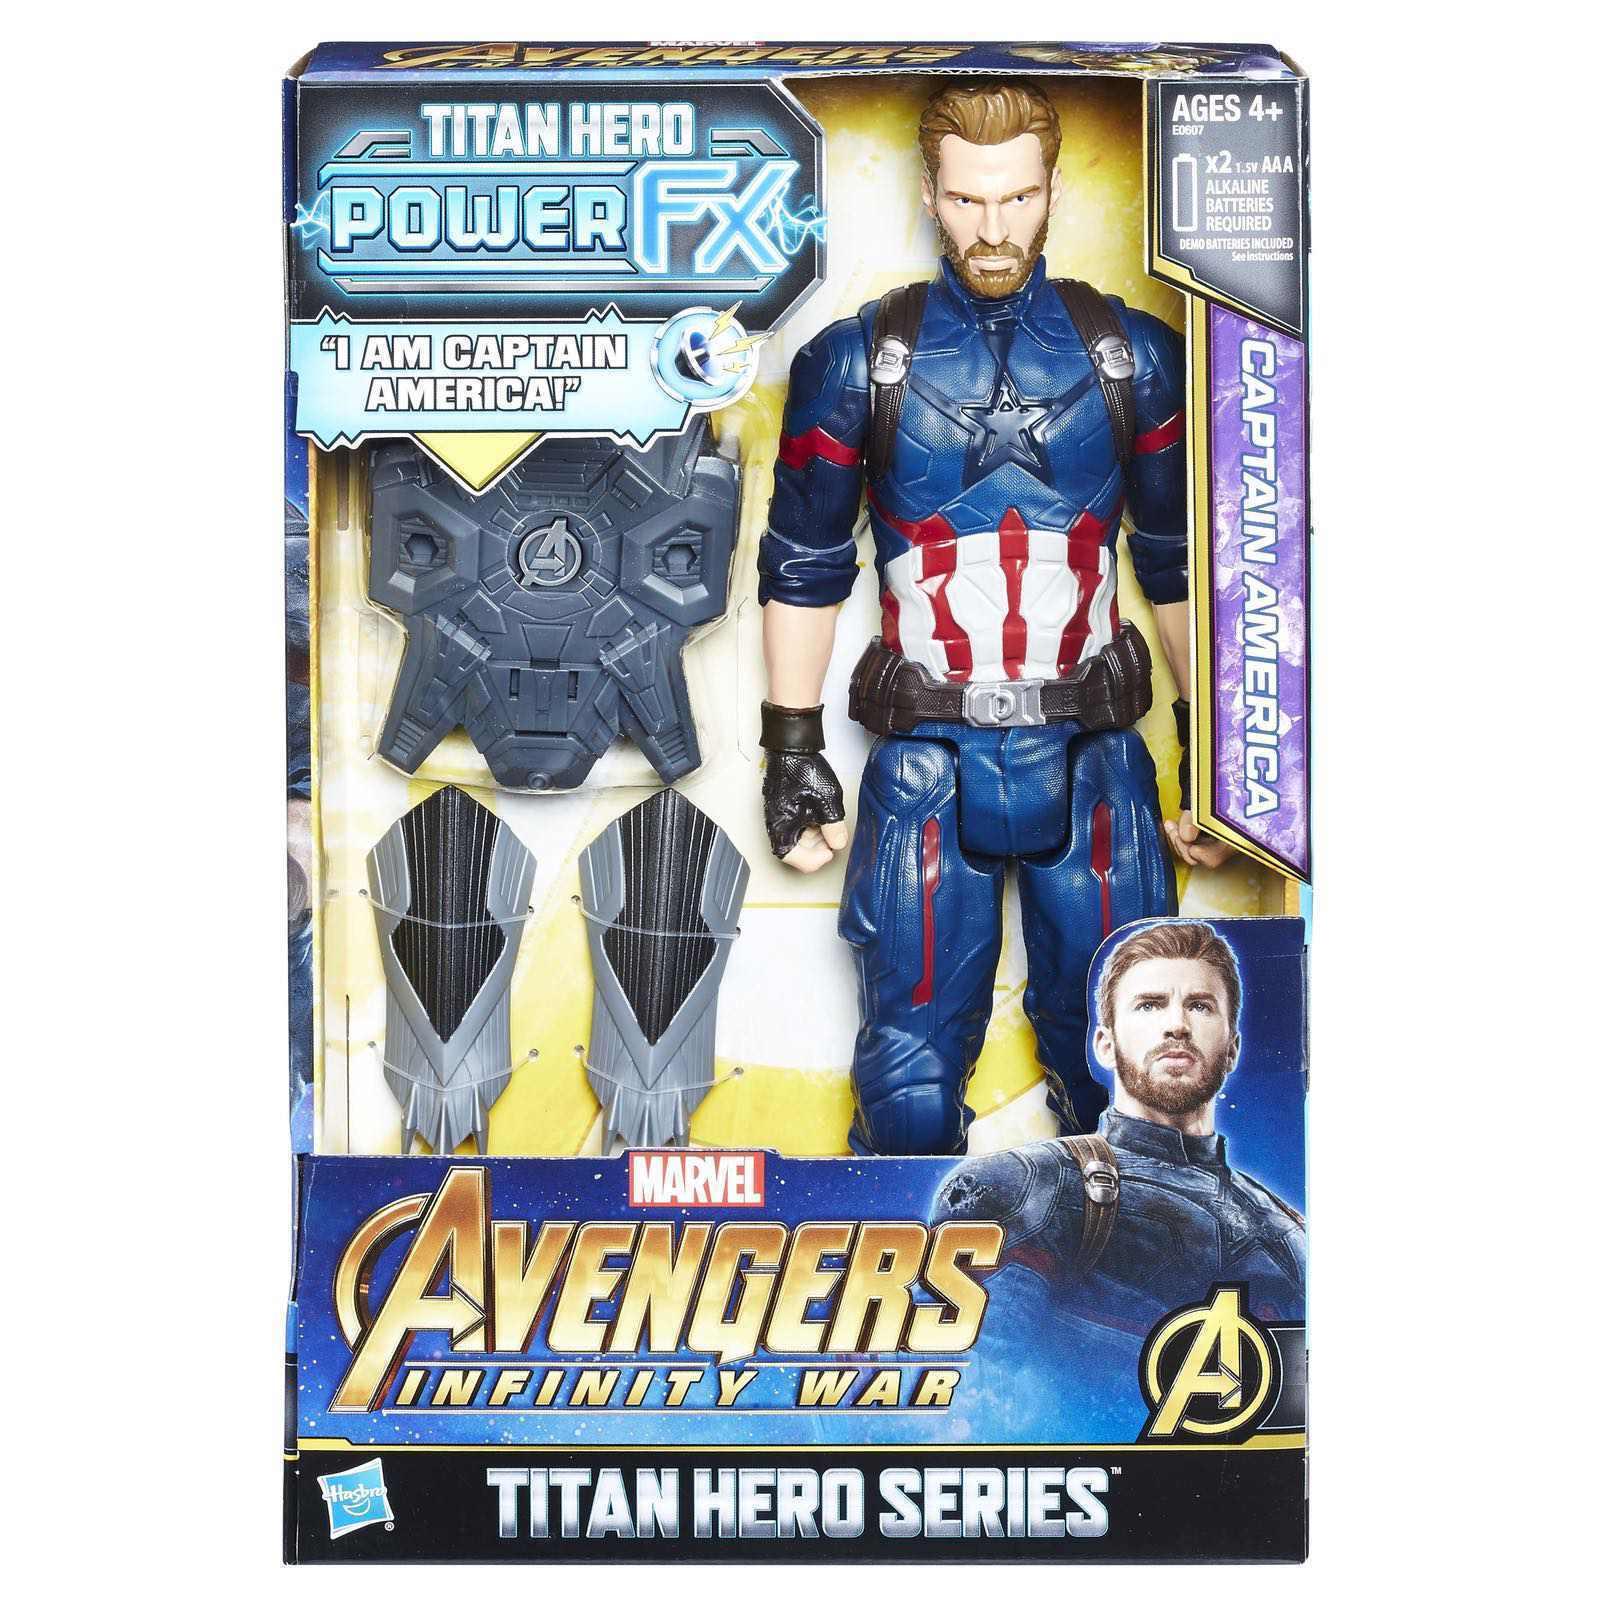 Hasbro marvel avengers 2 infinity krieg 12  titan - held captain america macht fx